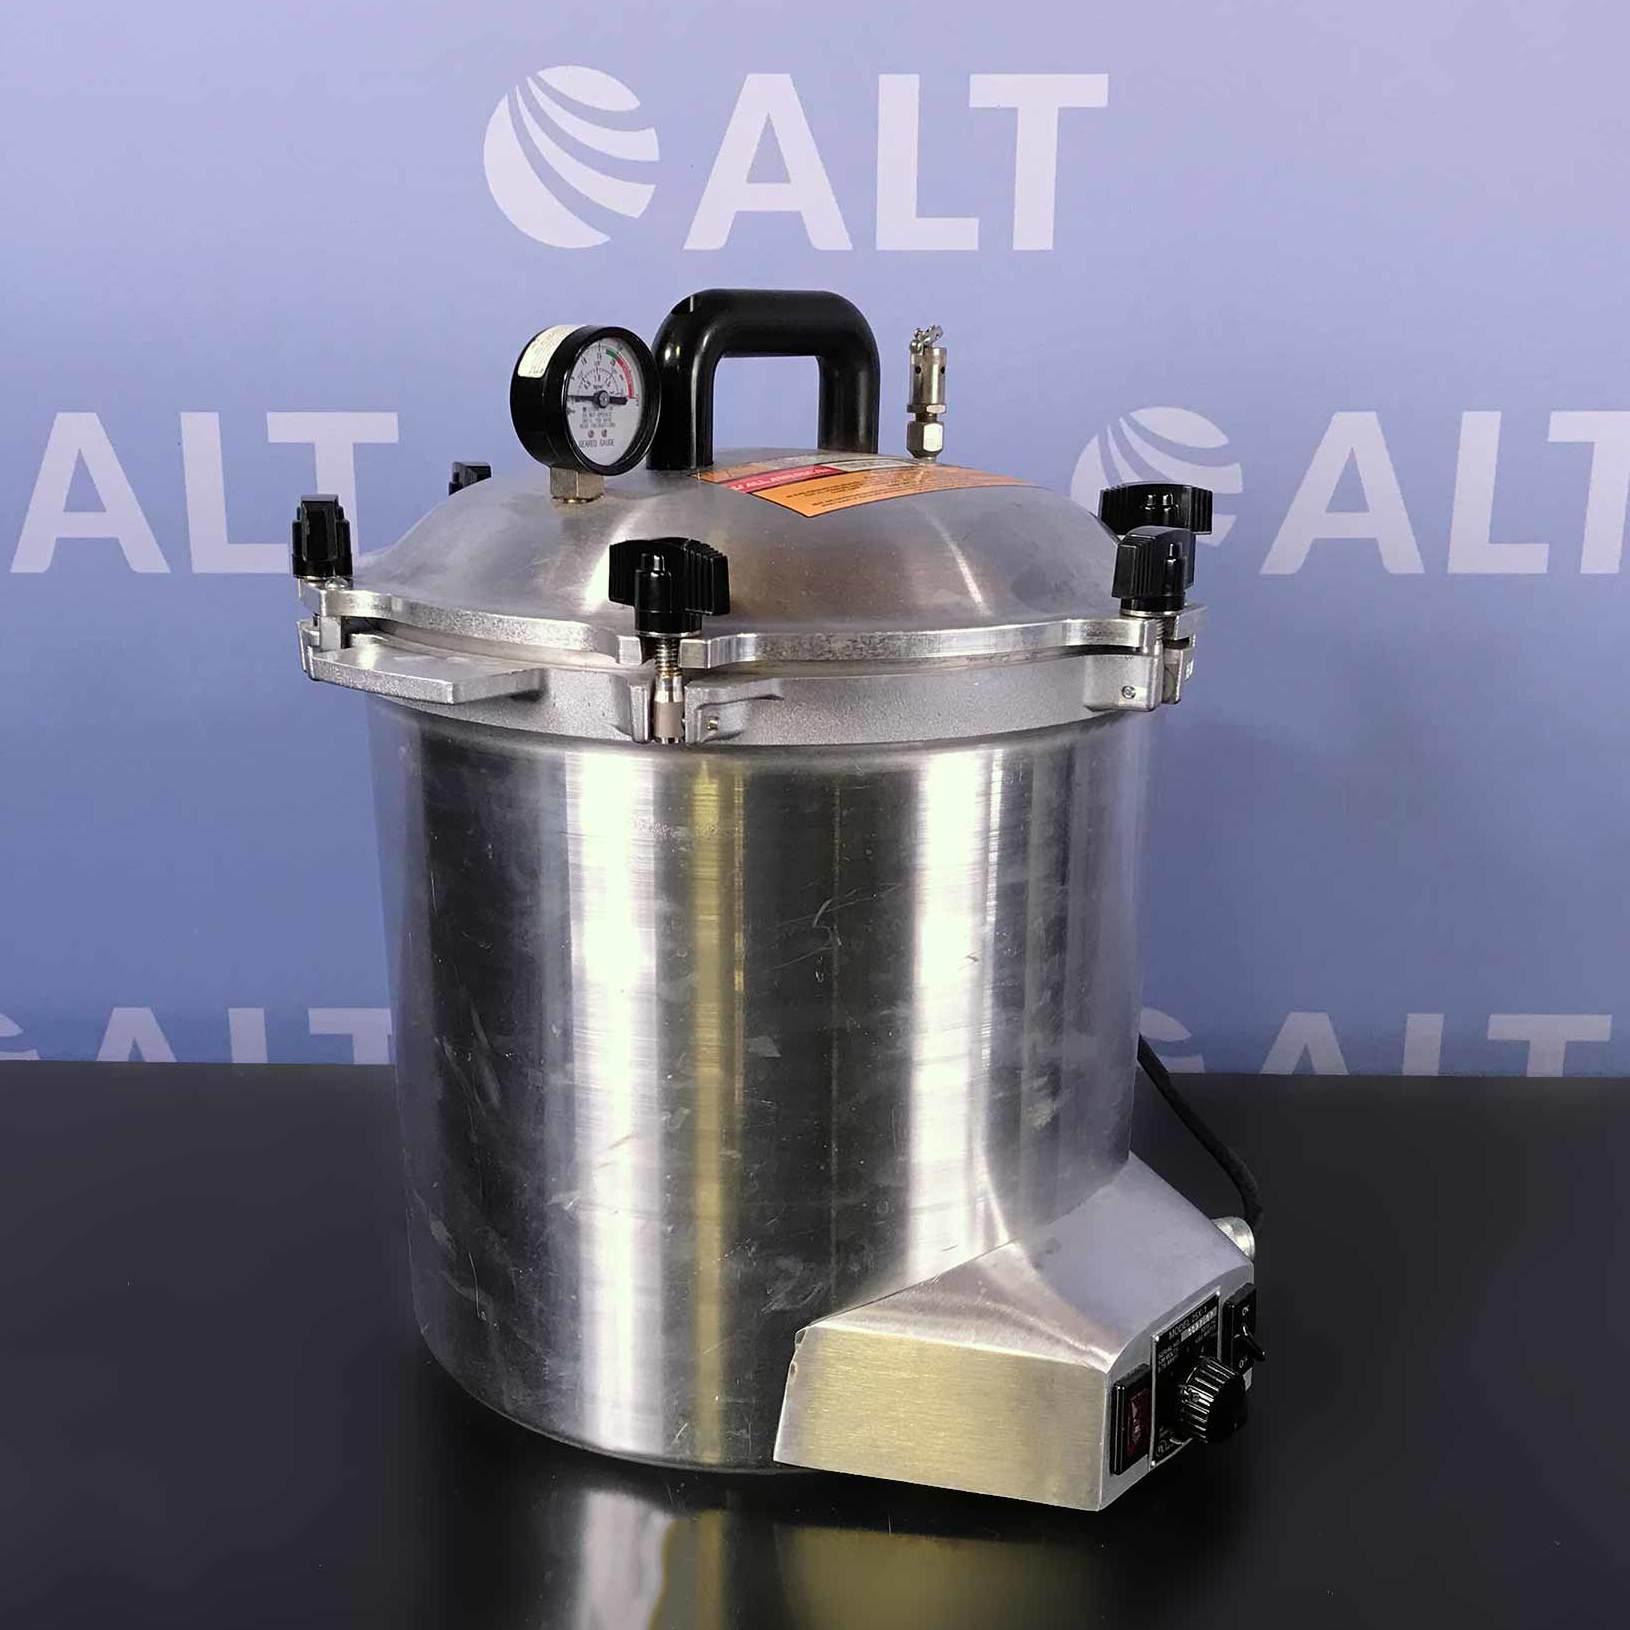 All American  Model 25x-1 Electric Steam Sterilizer 120V Image